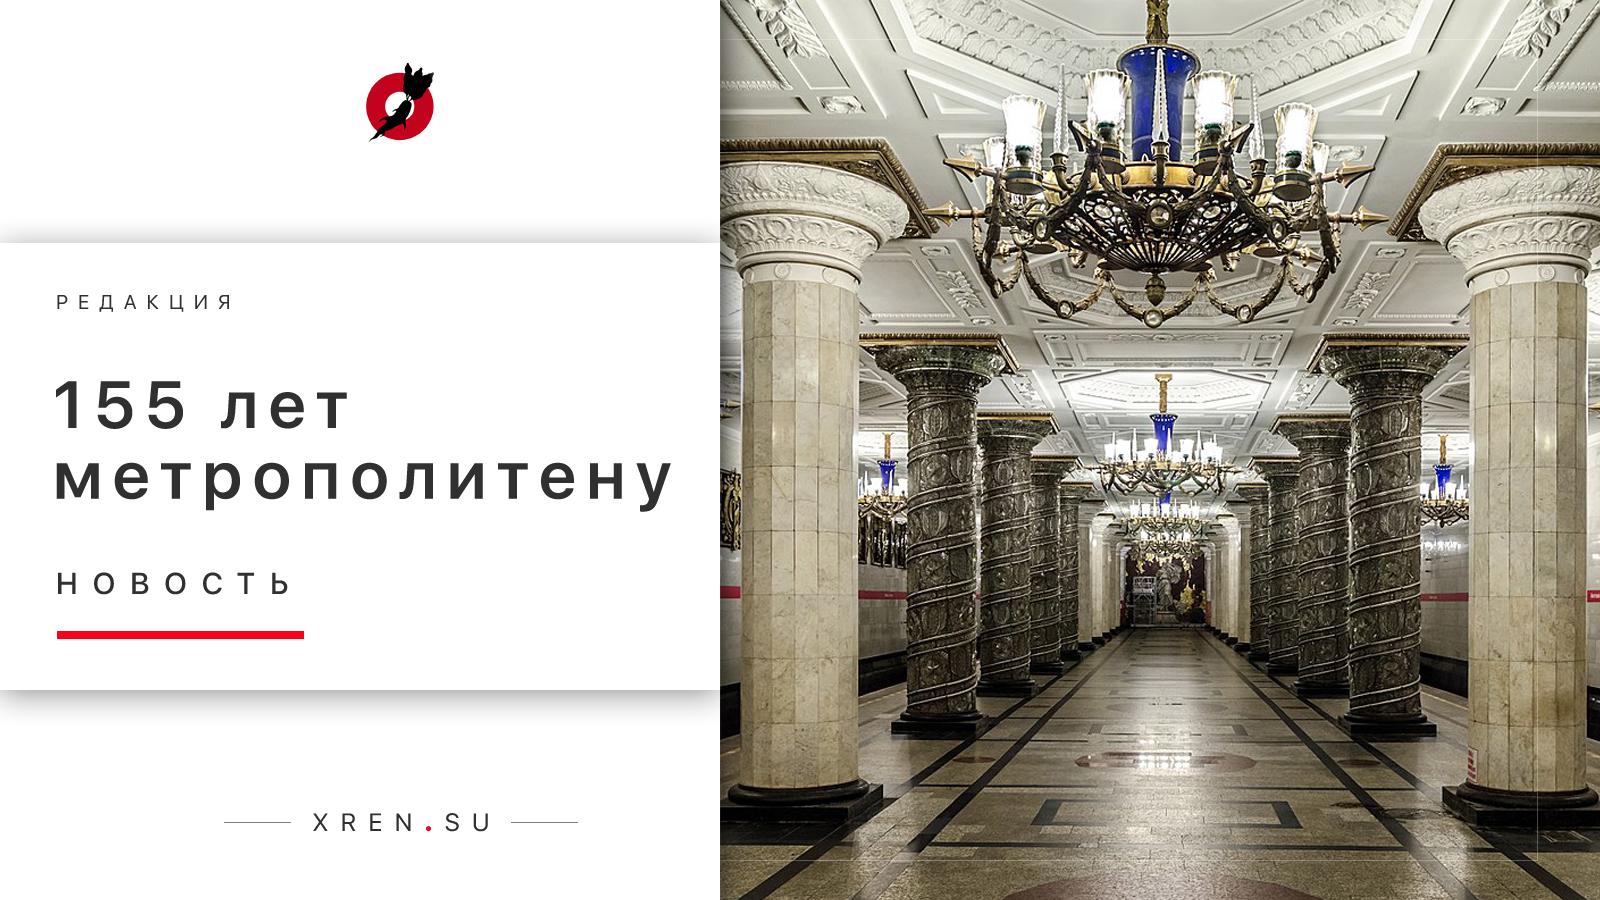 155 лет метрополитену